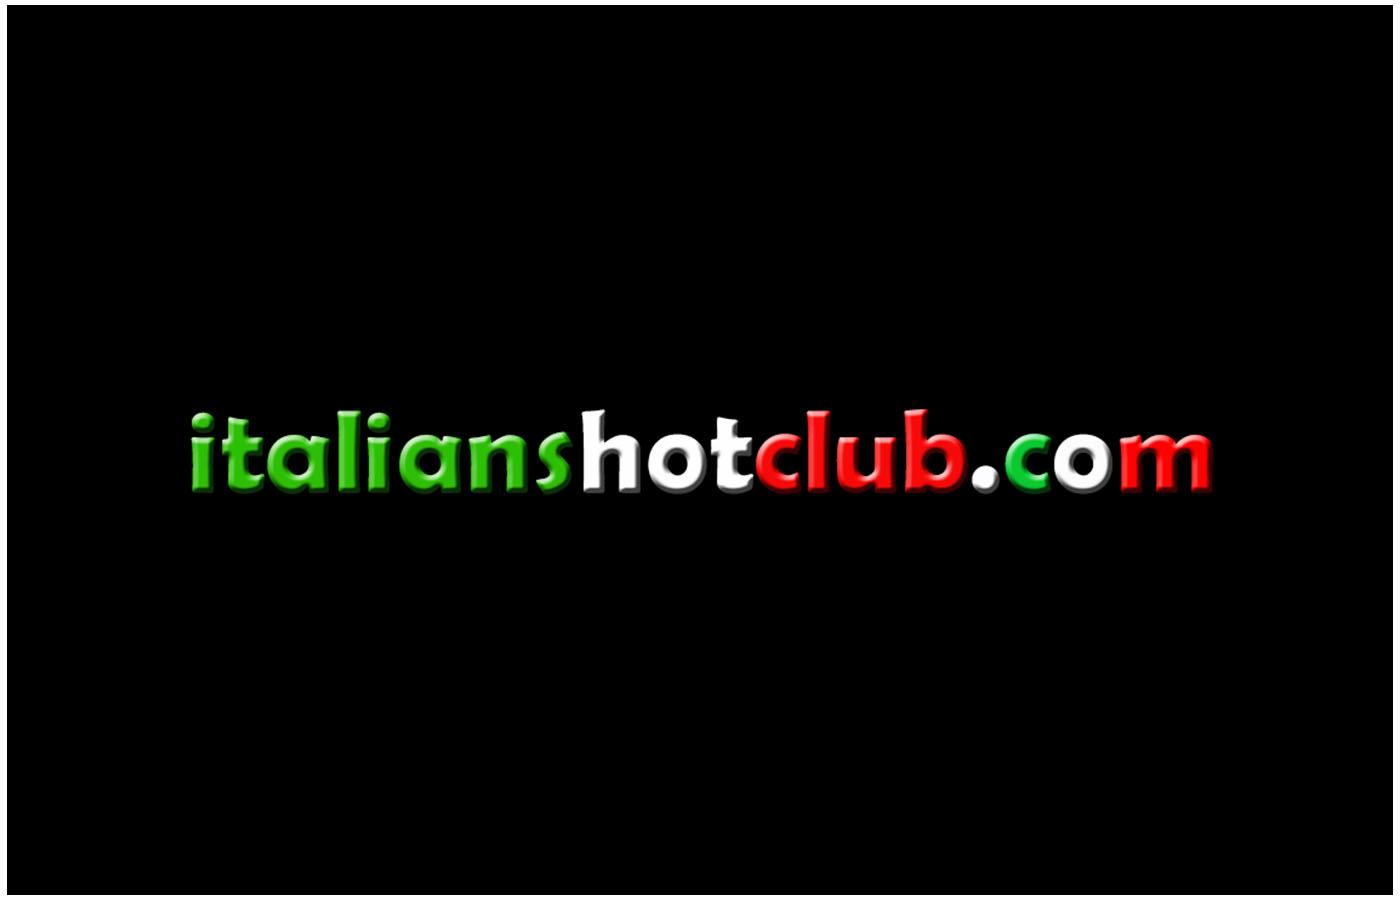 italianshotclub